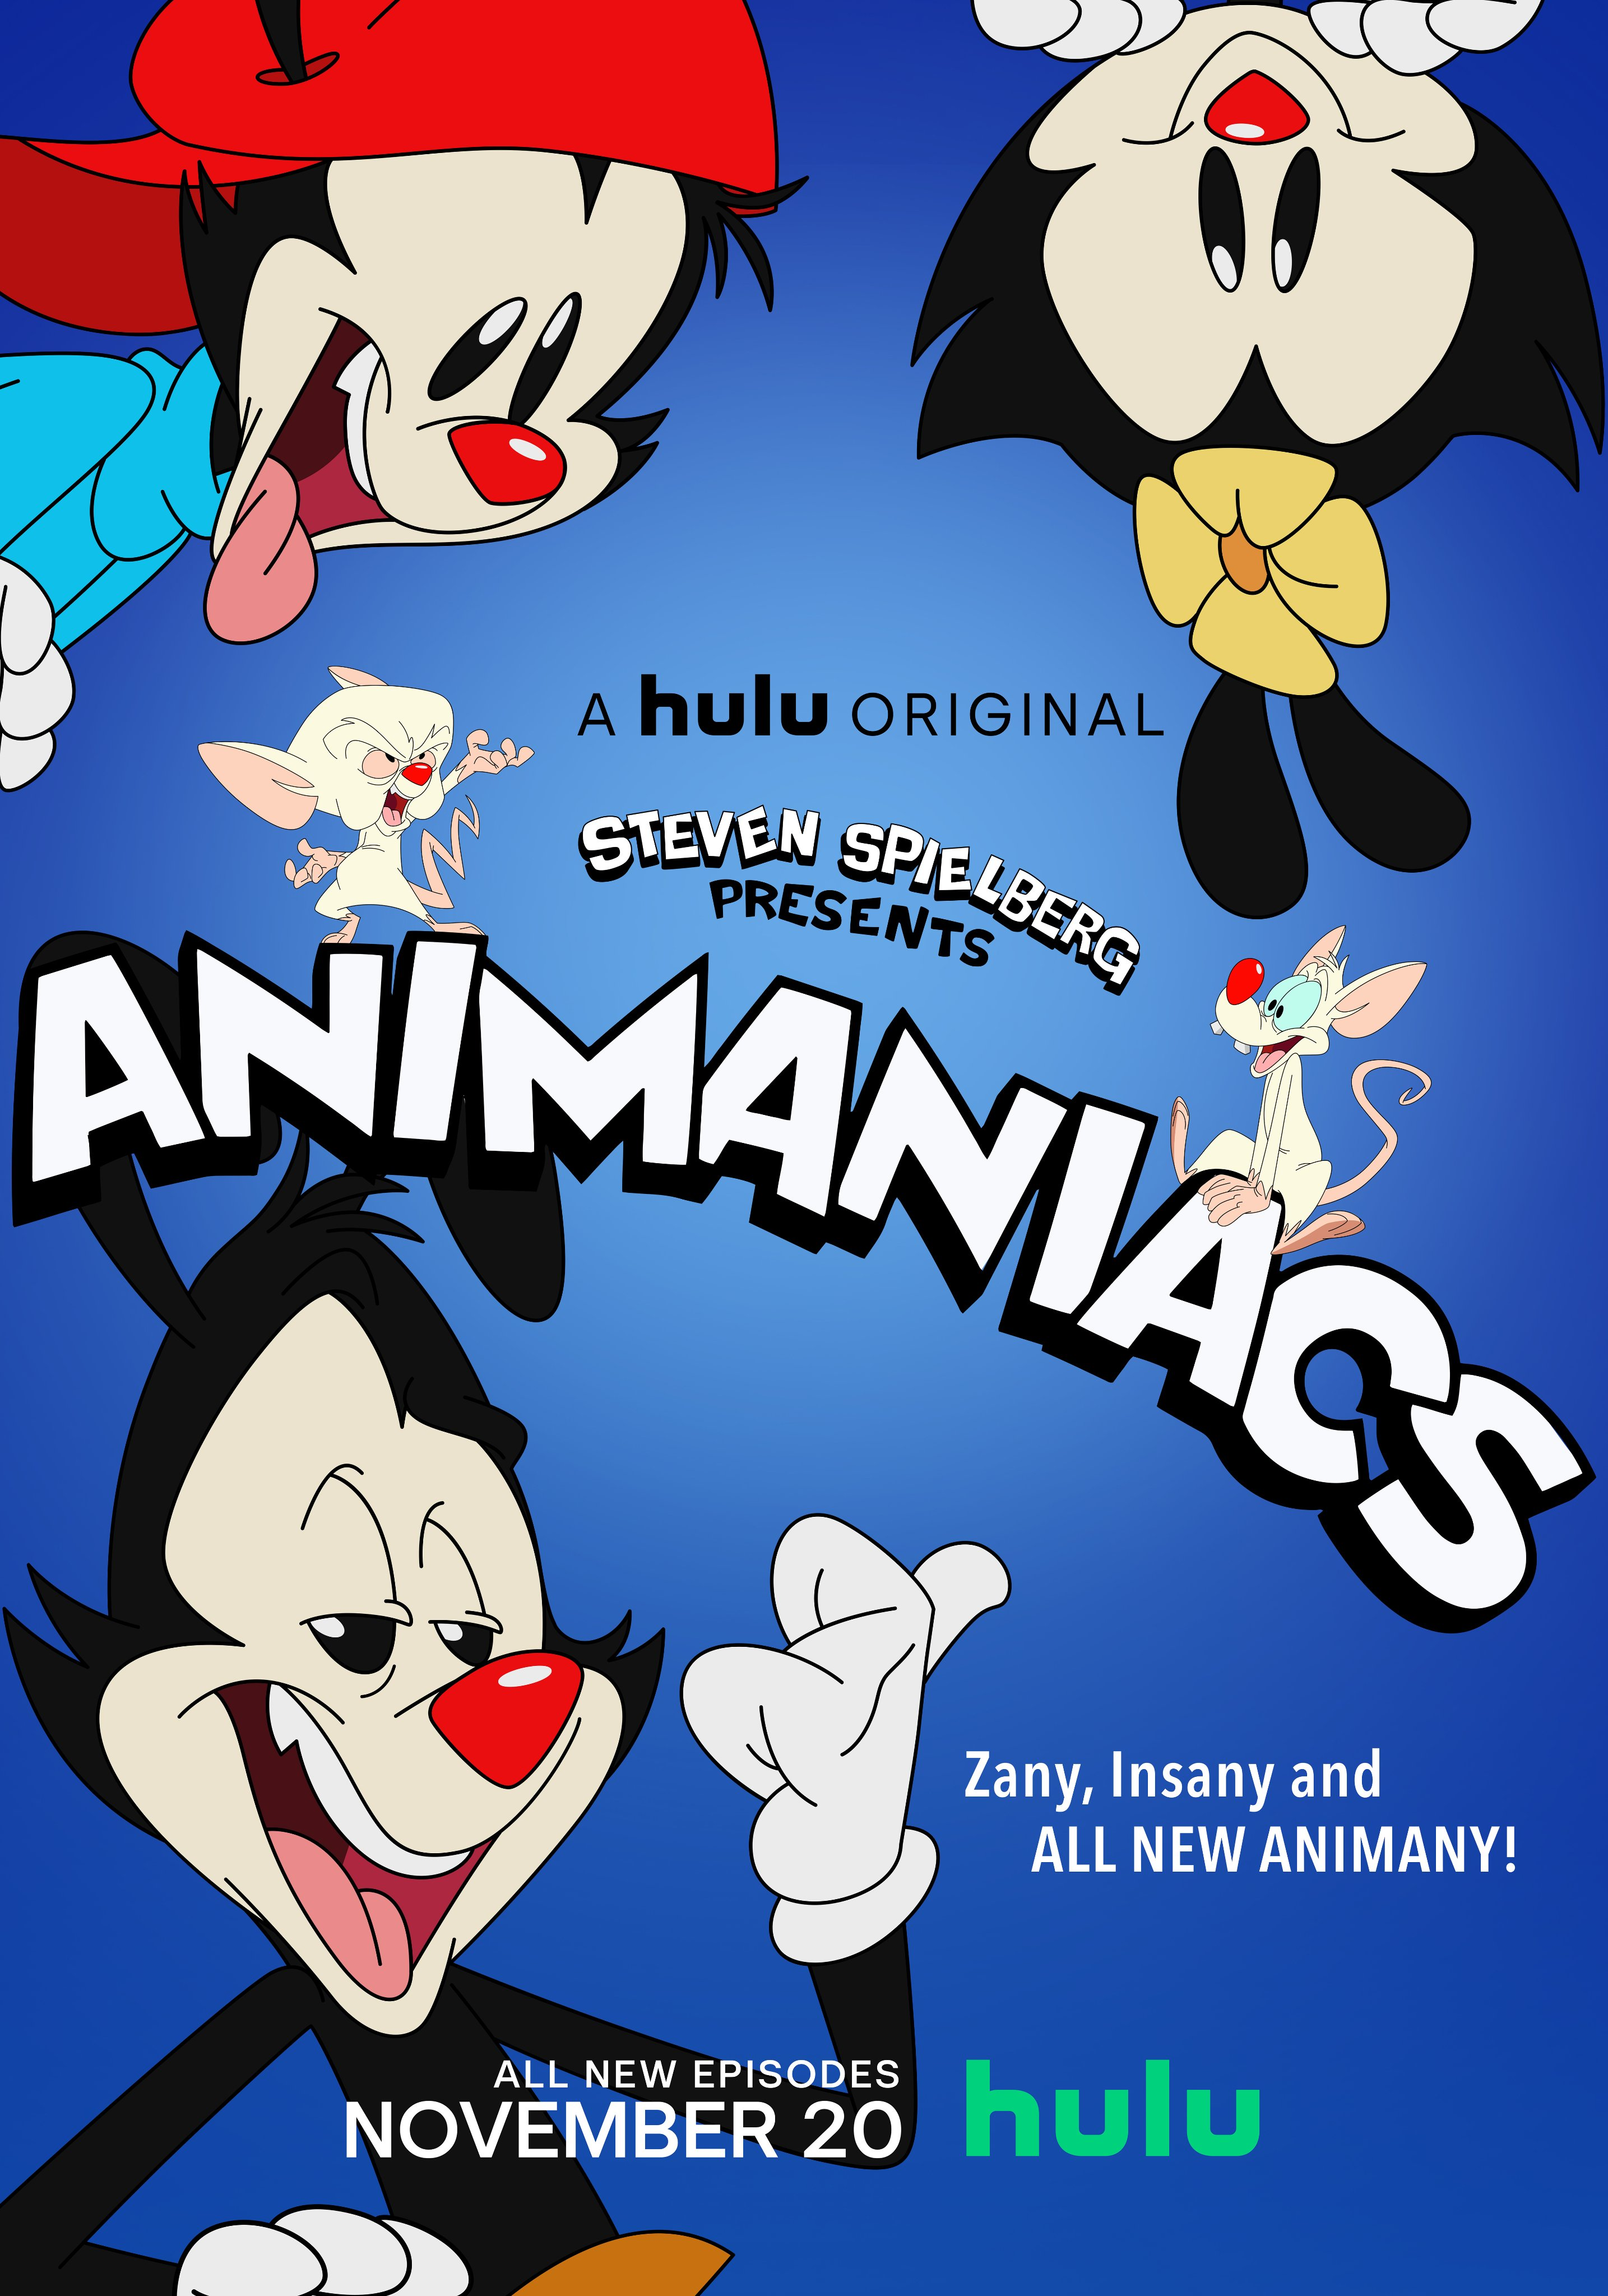 A Hulu original  Steven Spielberg presents Animaniacs Zany, Insany, and ALL NEW ANIMANY! ALL NEW EPISODES NOVEMBER 20 on HULU  Arriveranno anche su Disney+?